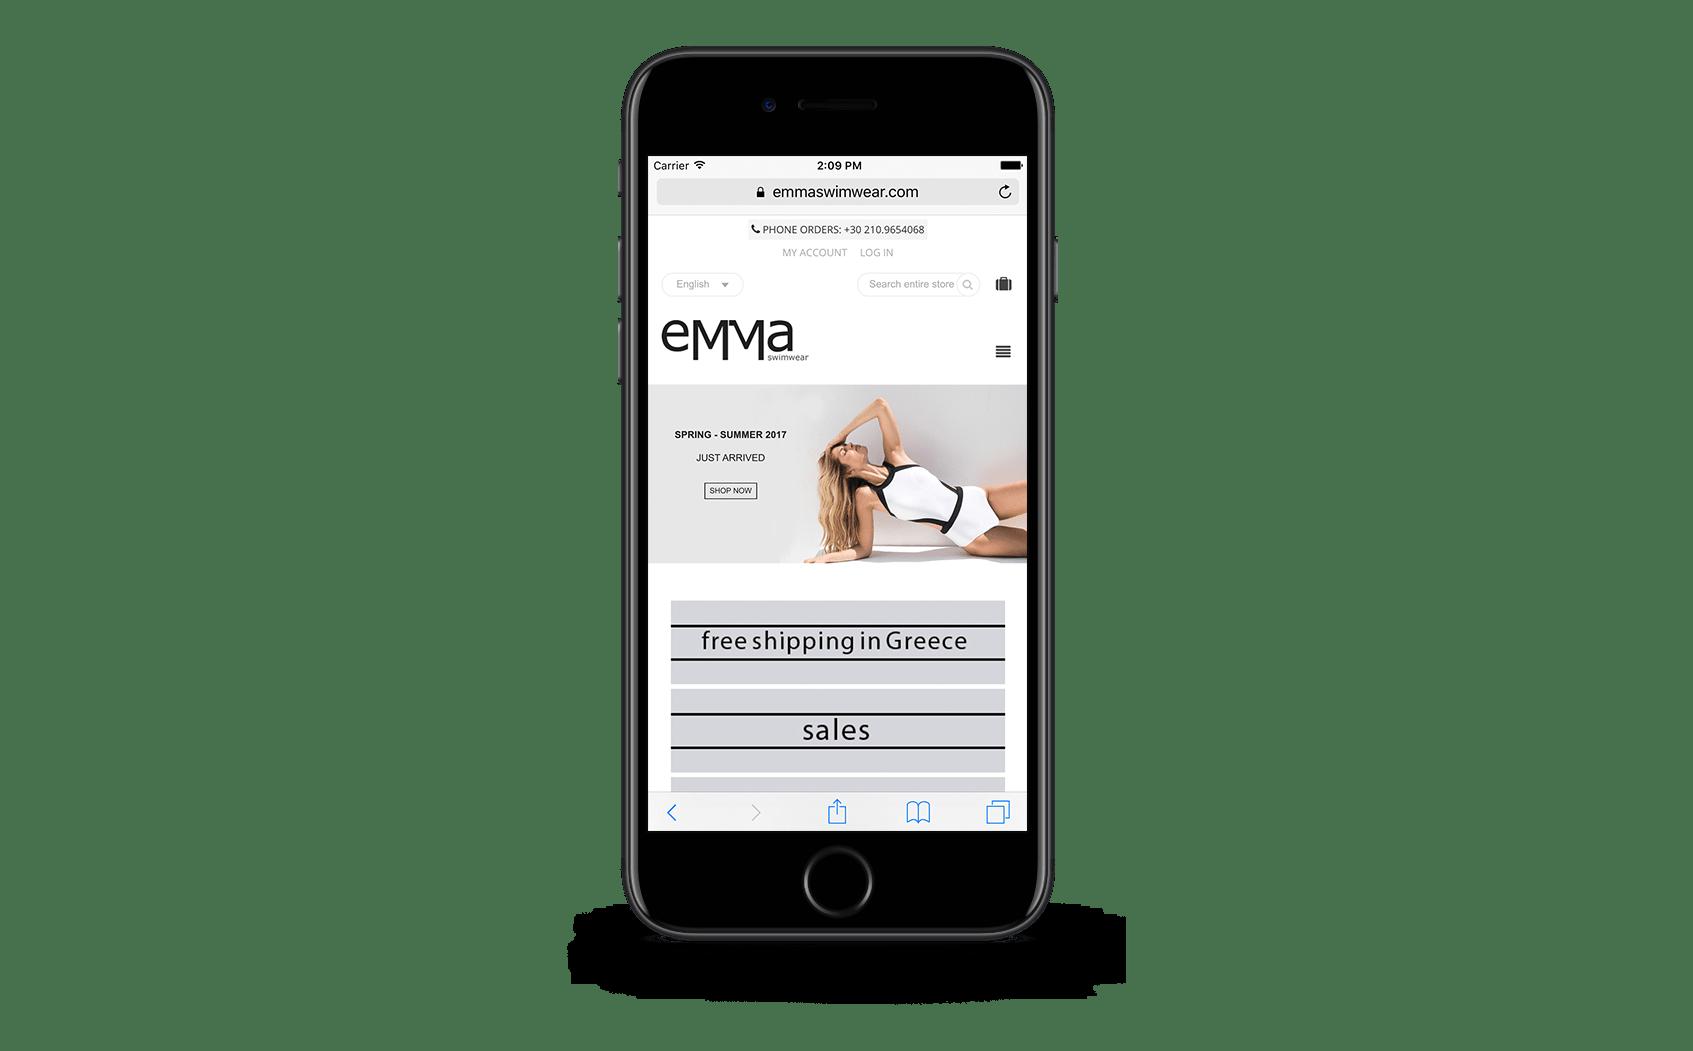 emmaswimwear.com